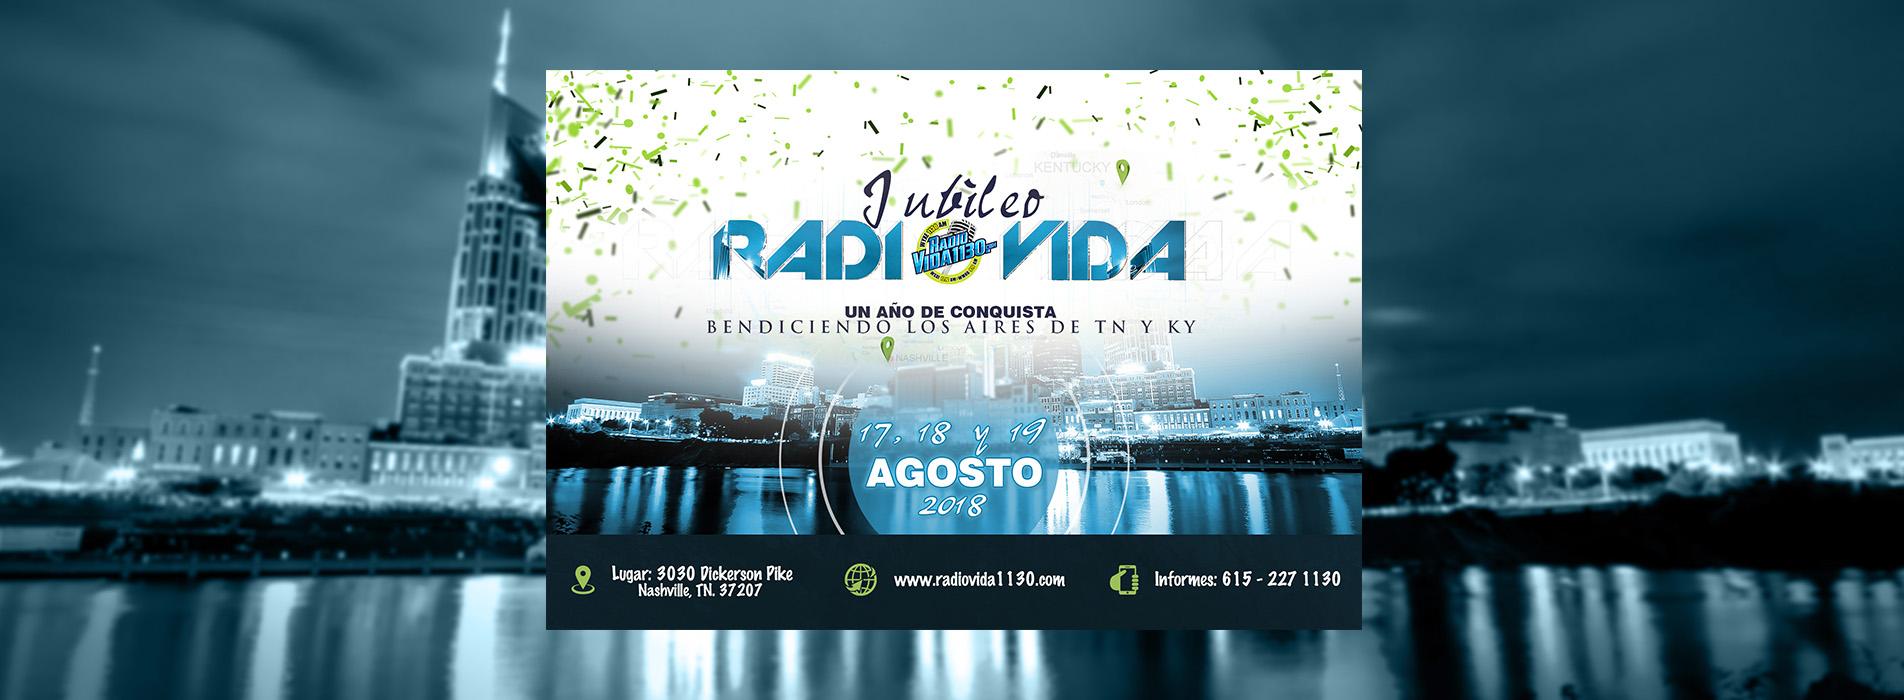 Main-Slider-Radio-Vida-Jubileo-2018